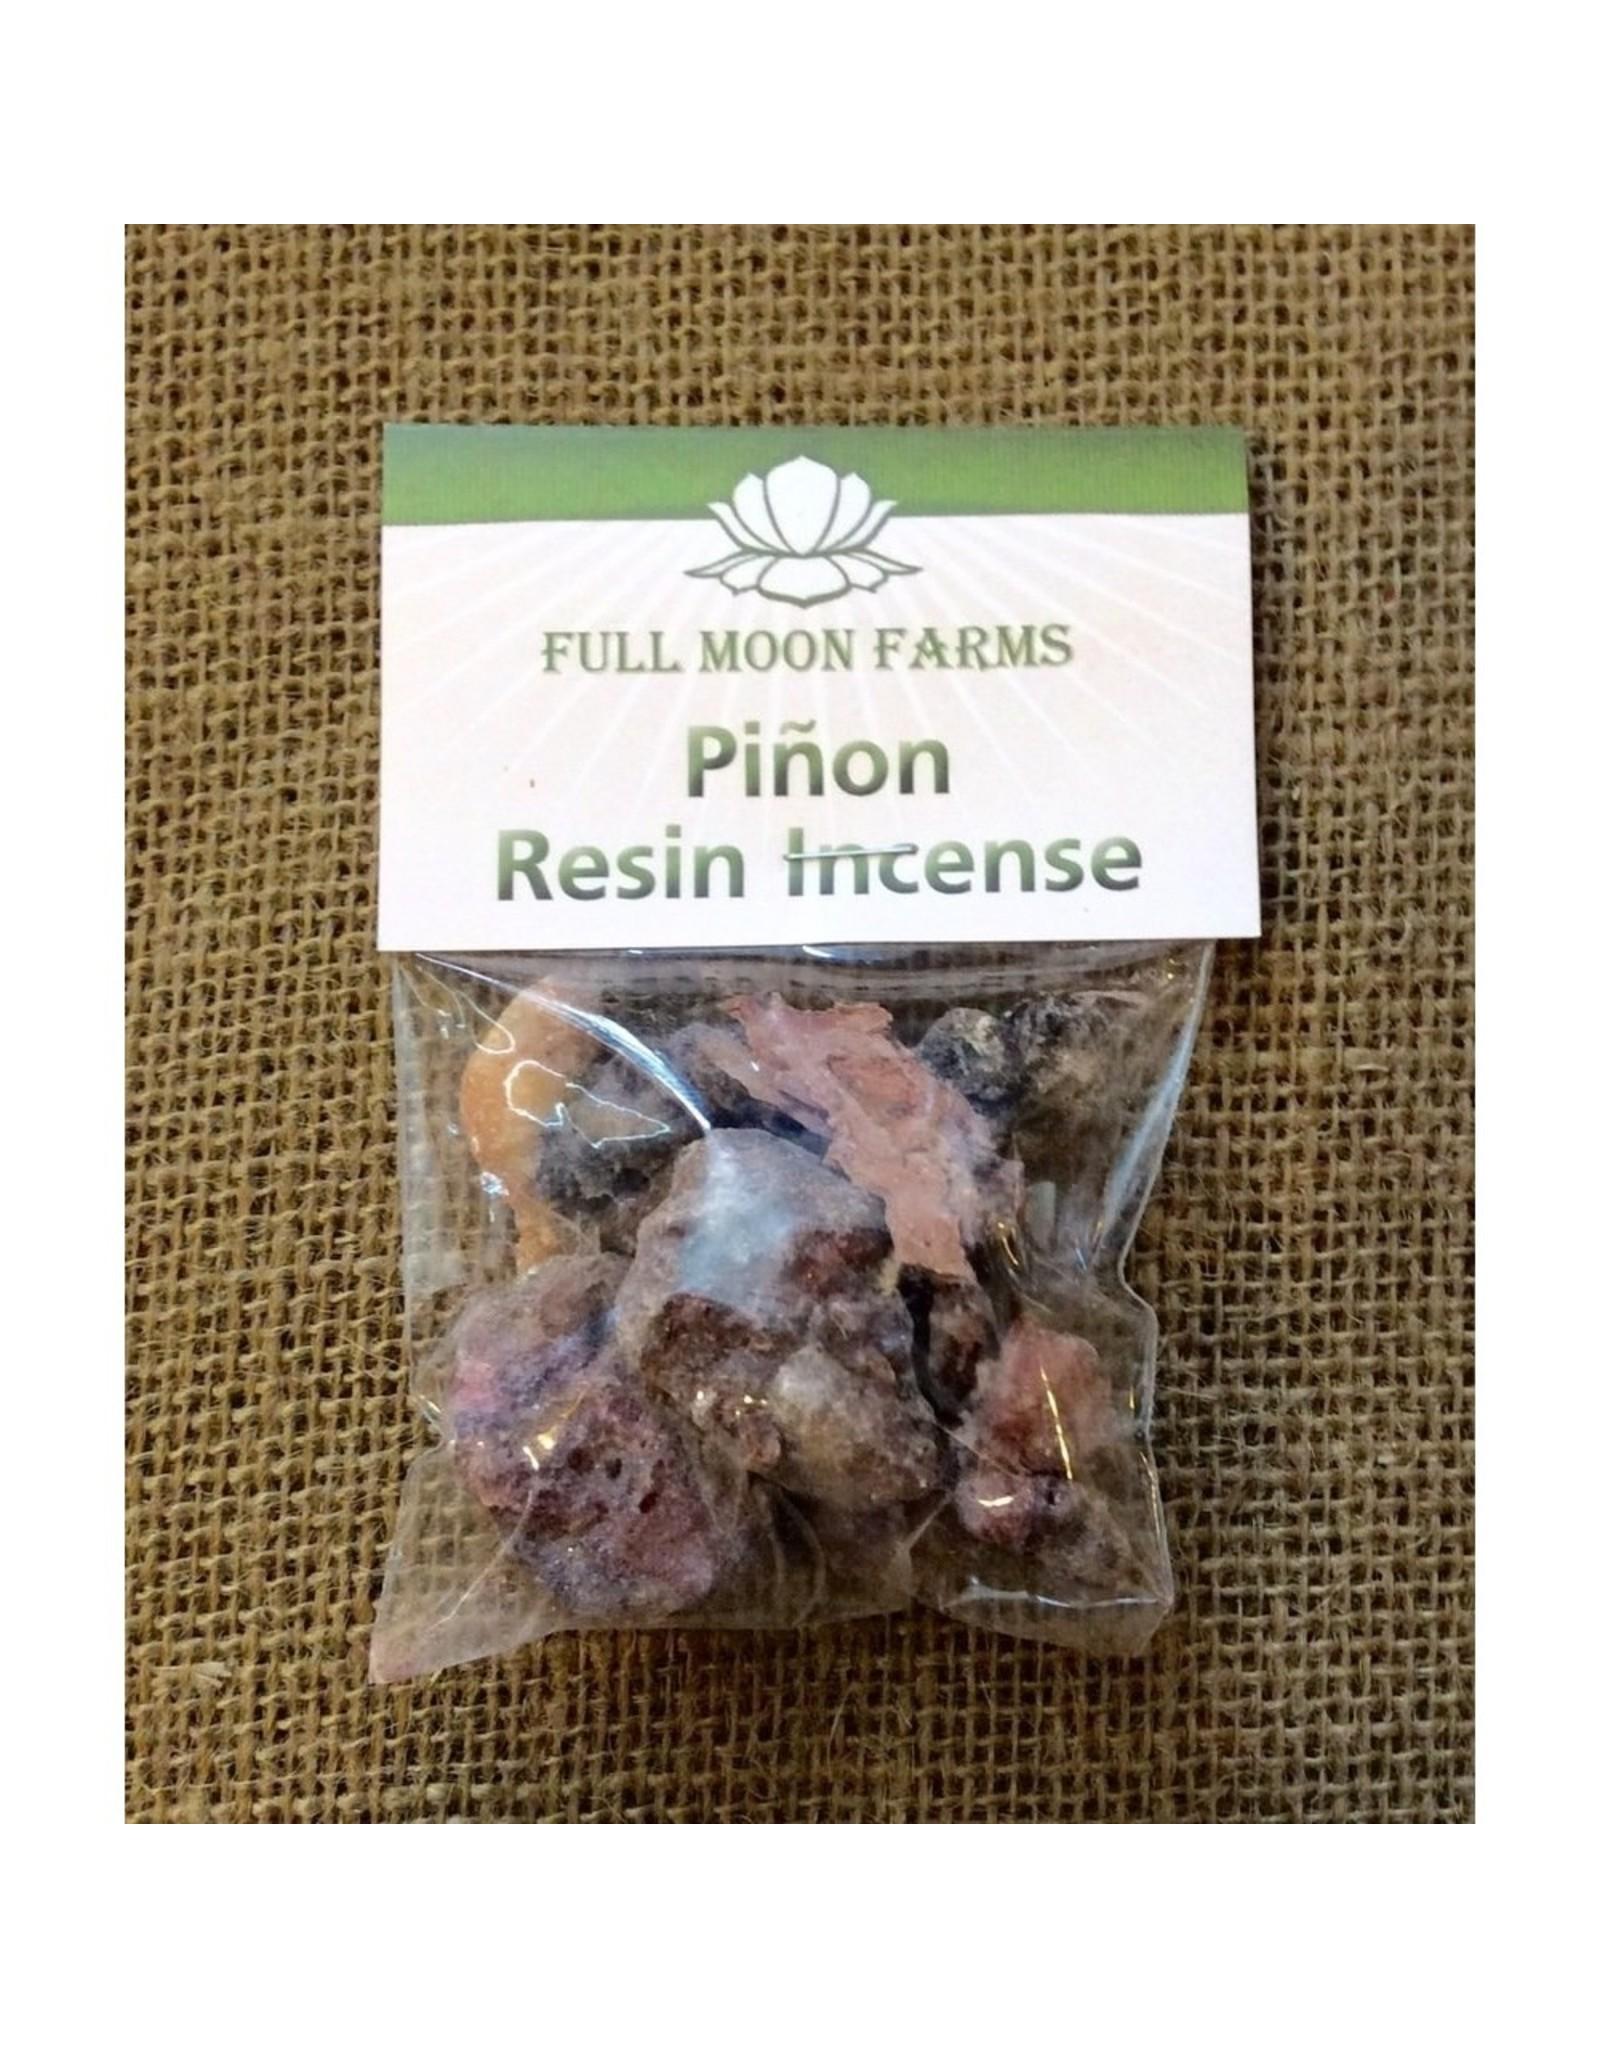 Full Moons Farms Resin Incense | Piñon